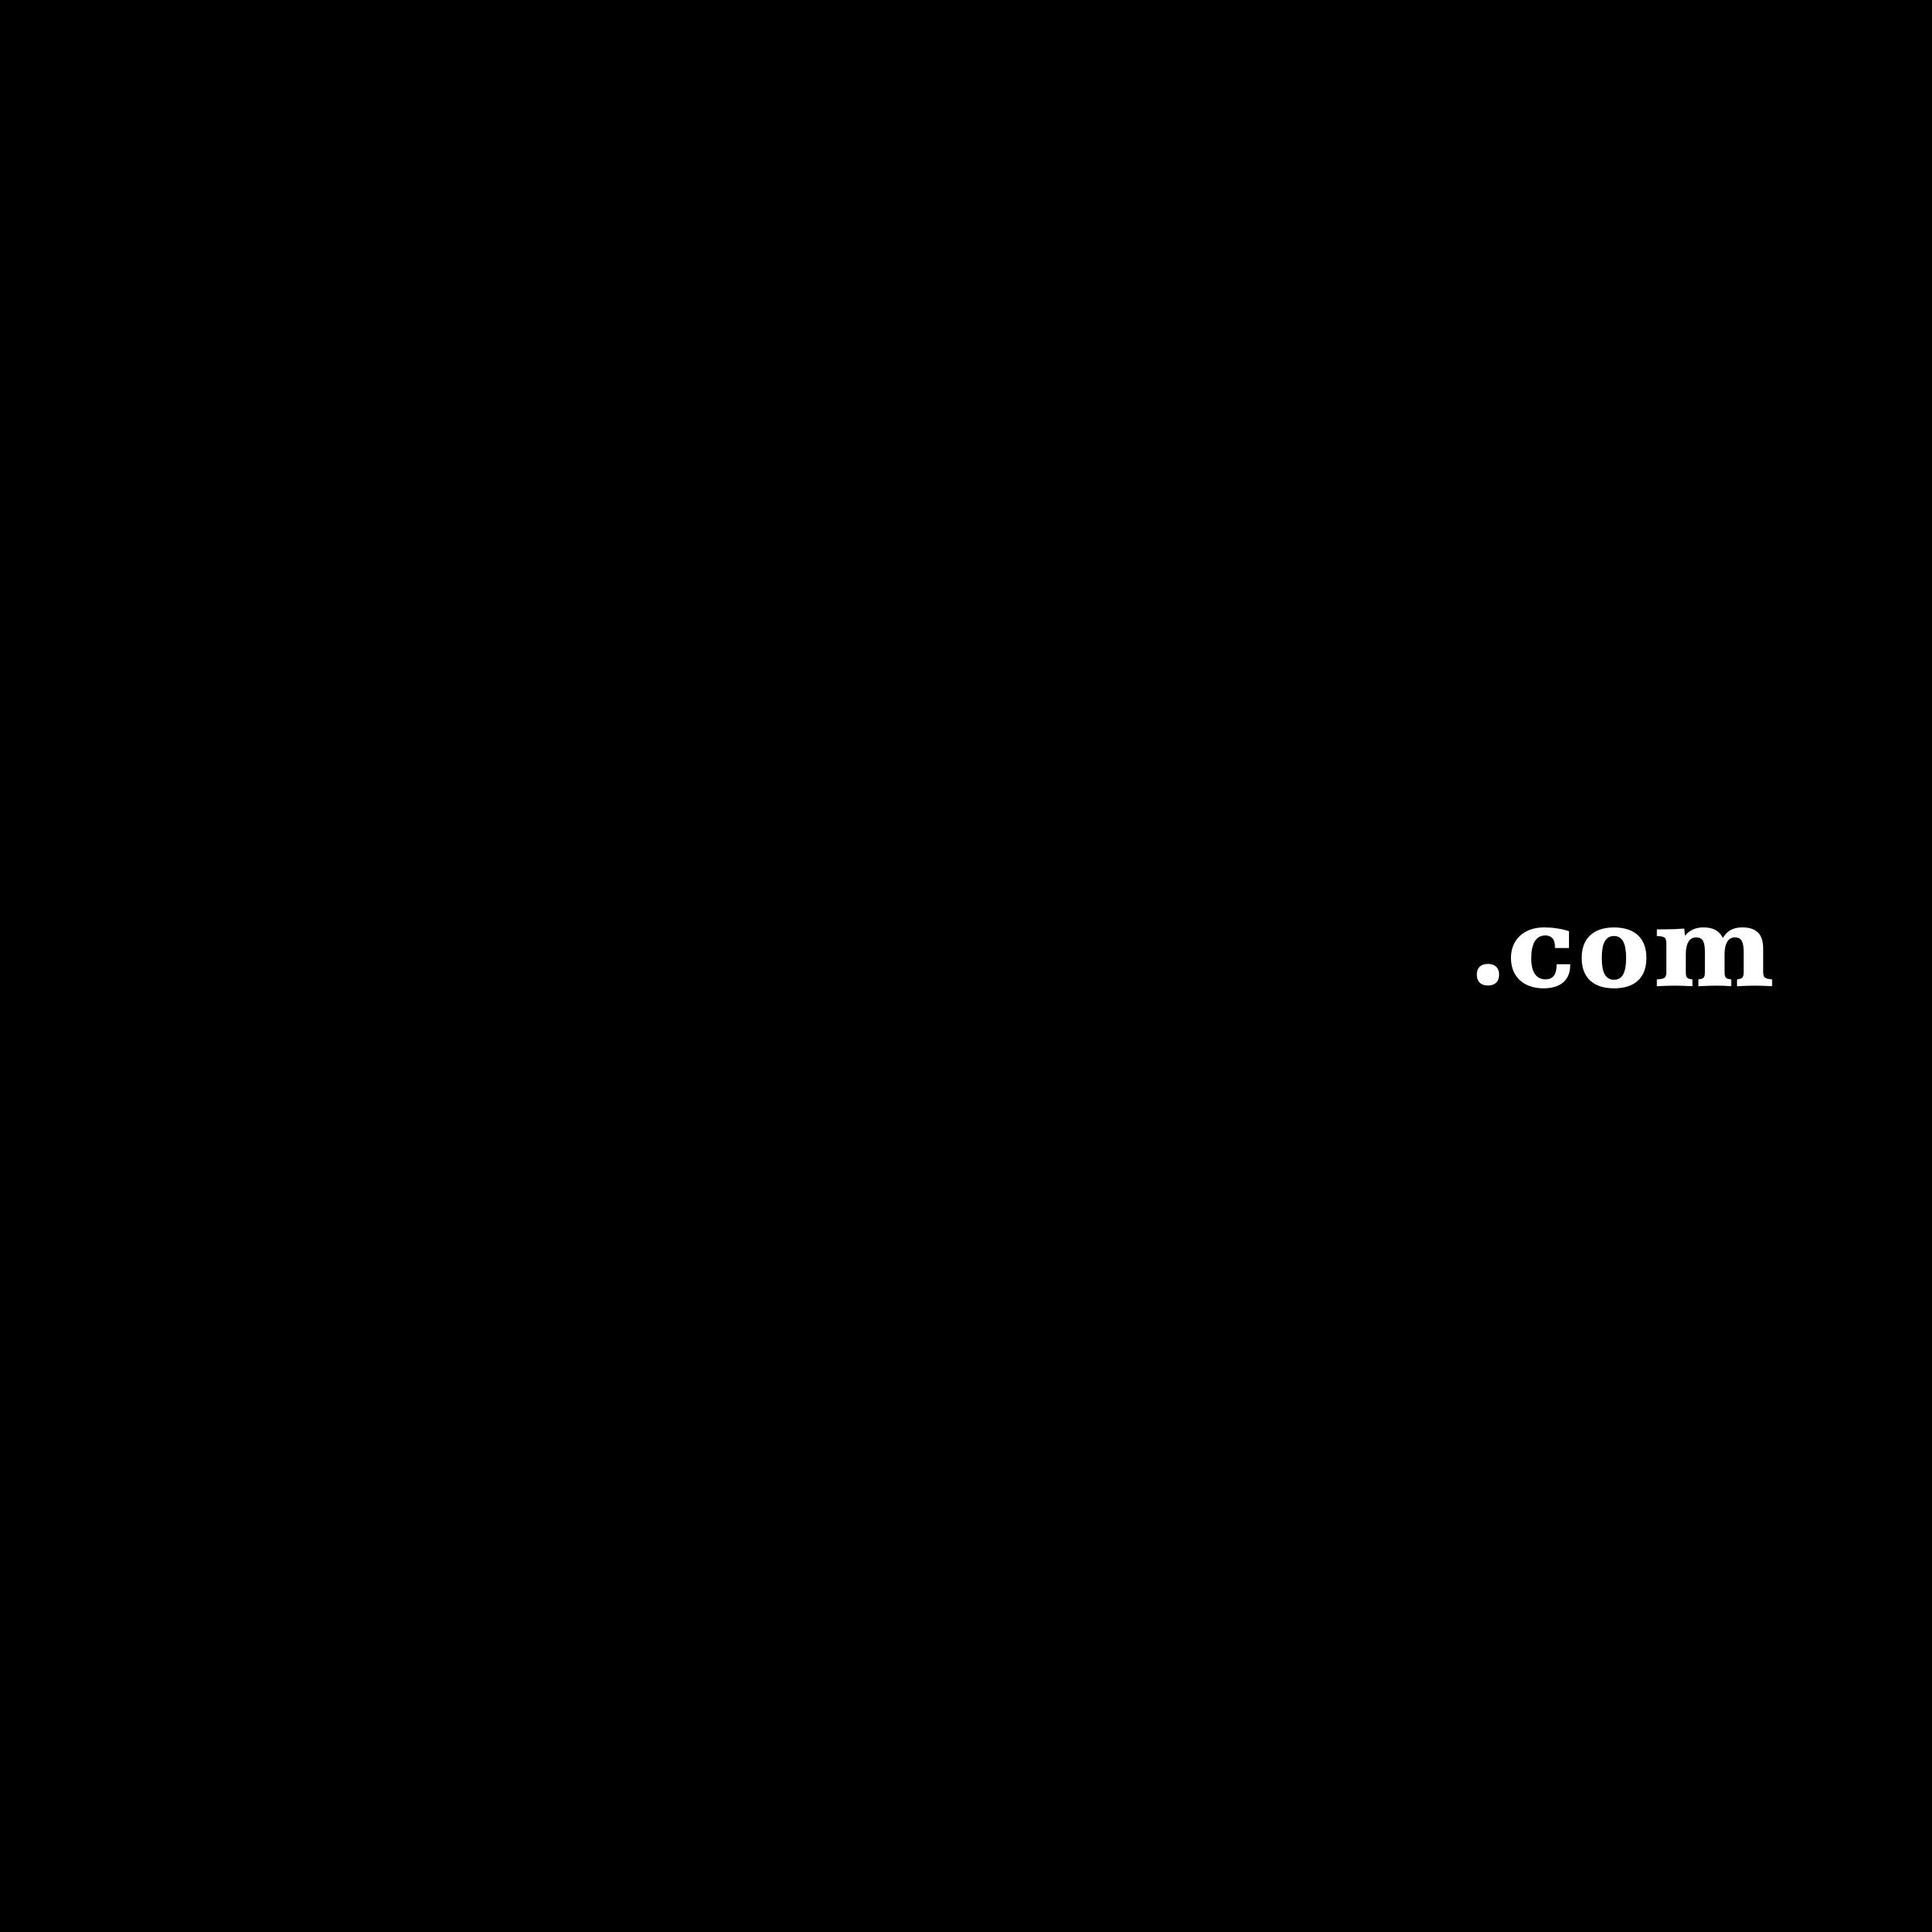 AutoTrader com Logo PNG Transparent & SVG Vector.